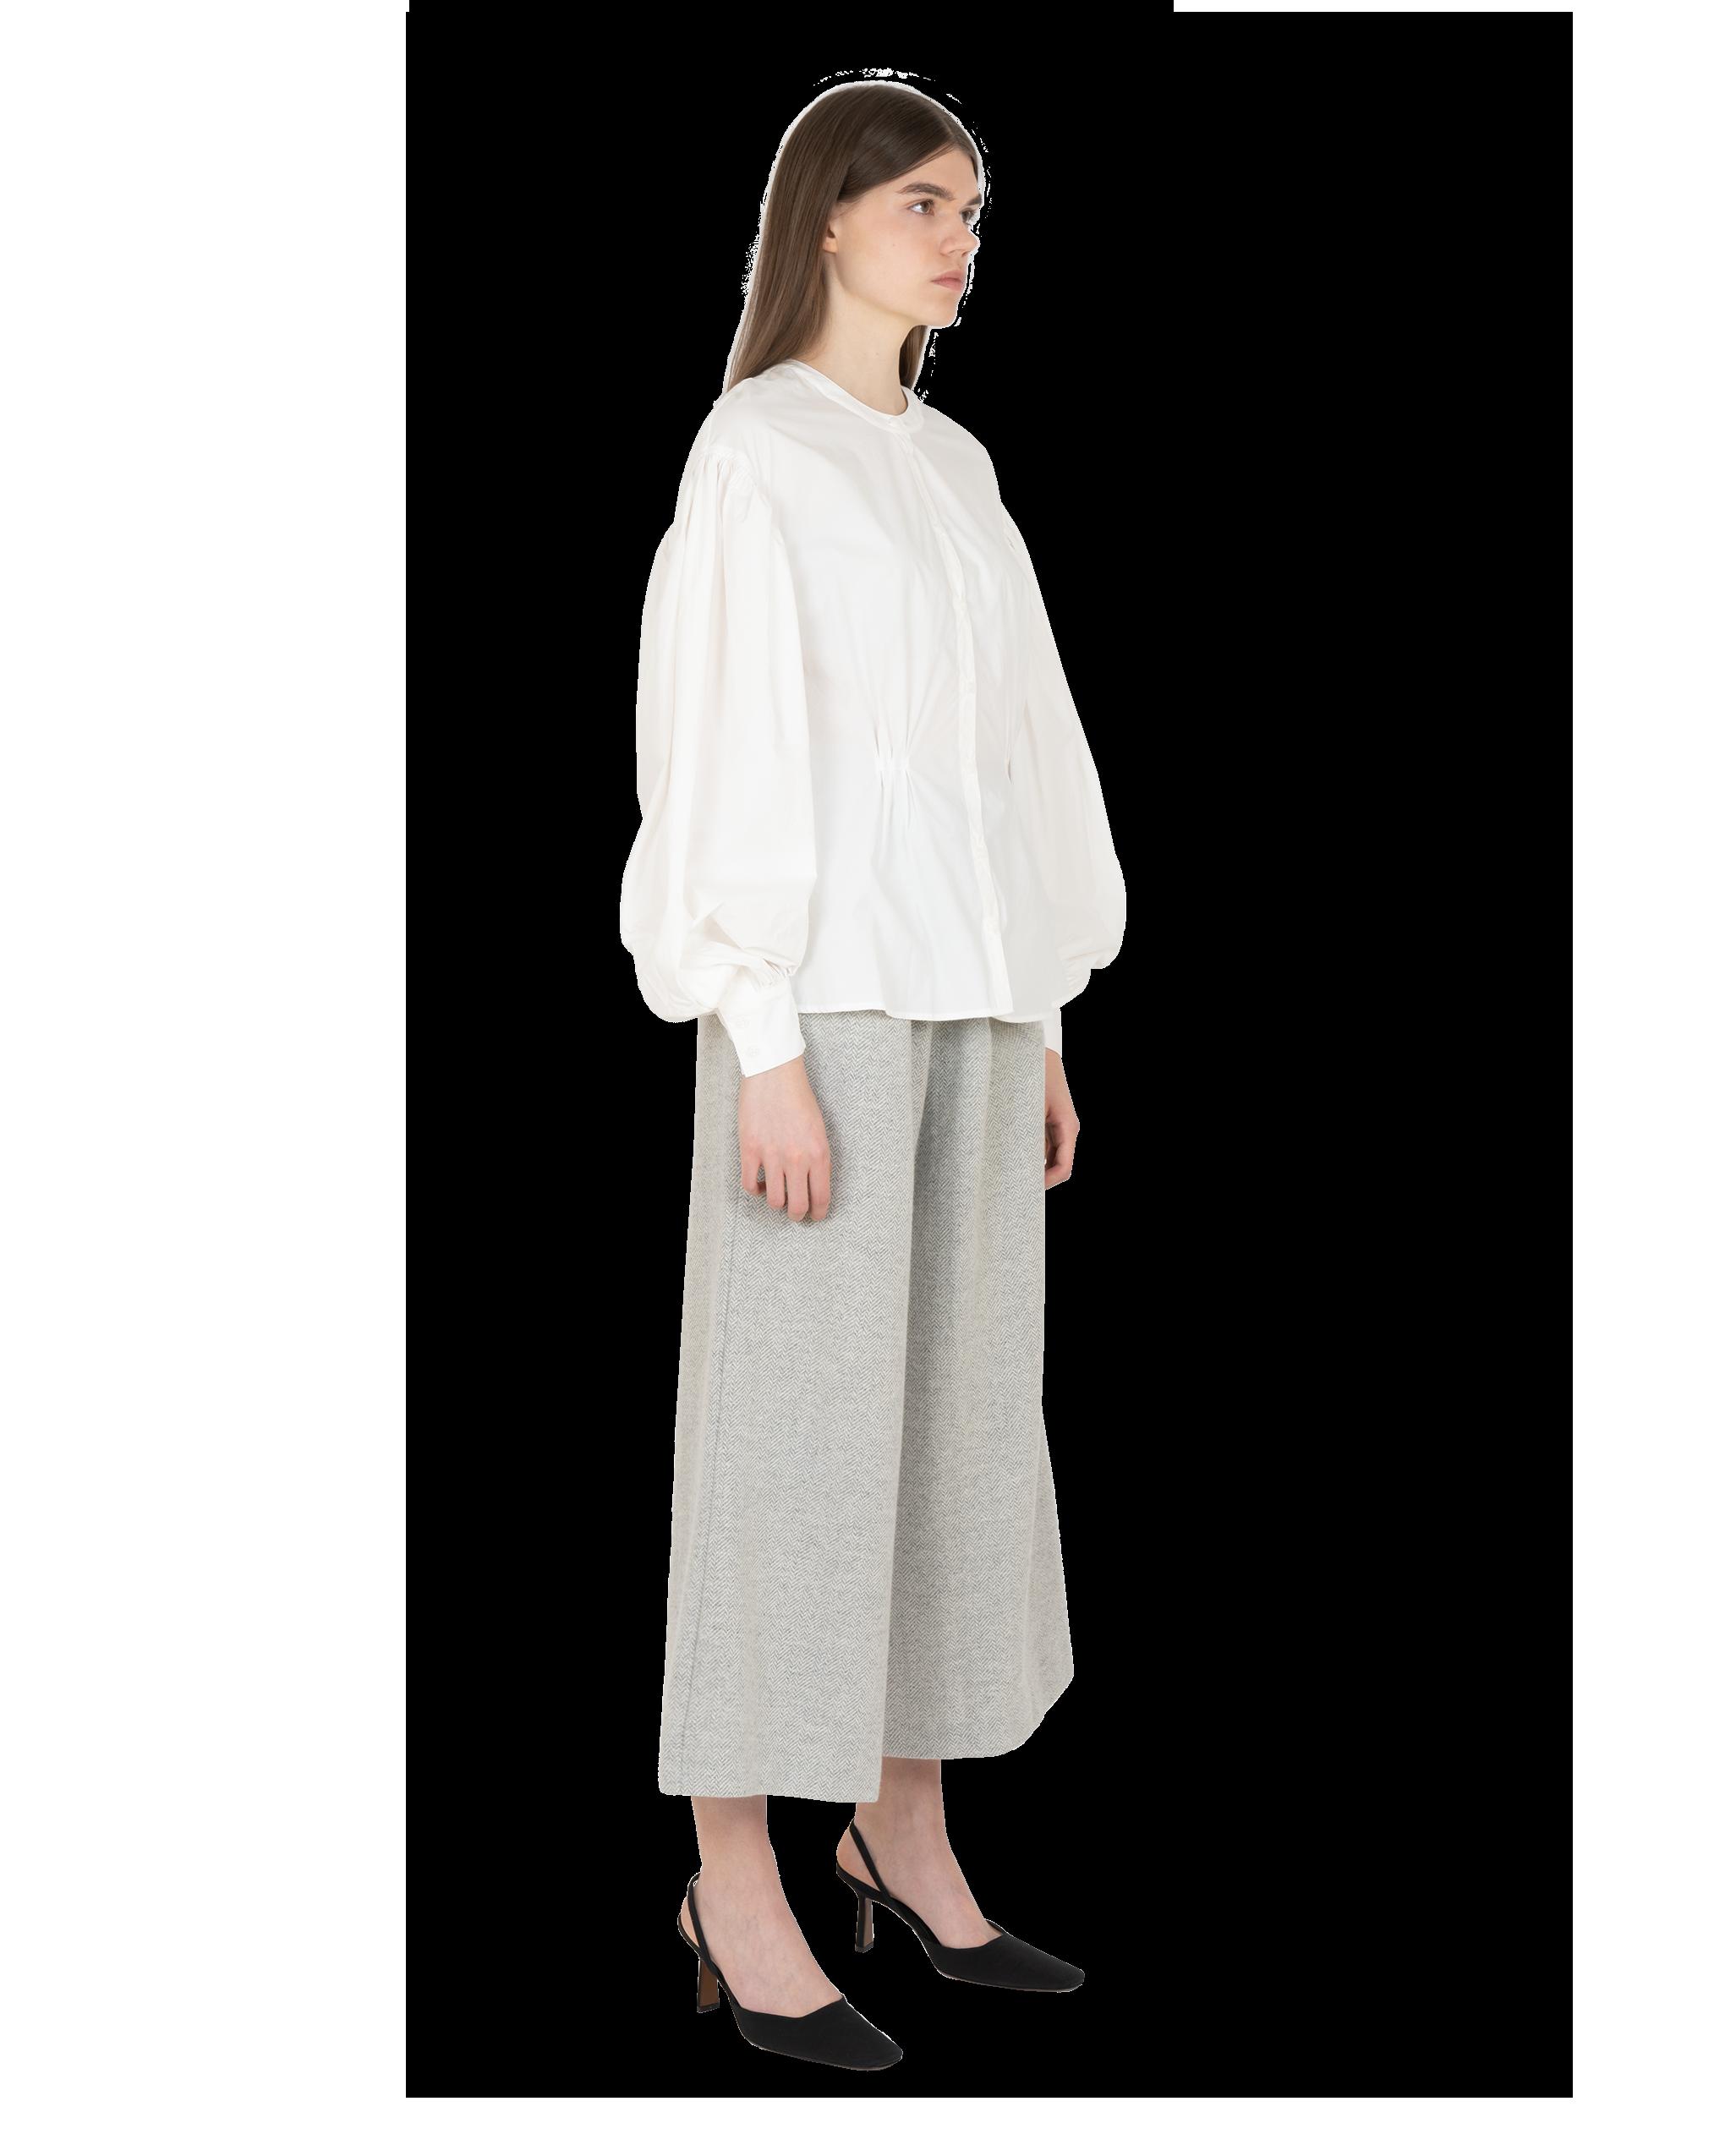 Model wearing EMIN + PAUL white cinched illusion shirt.